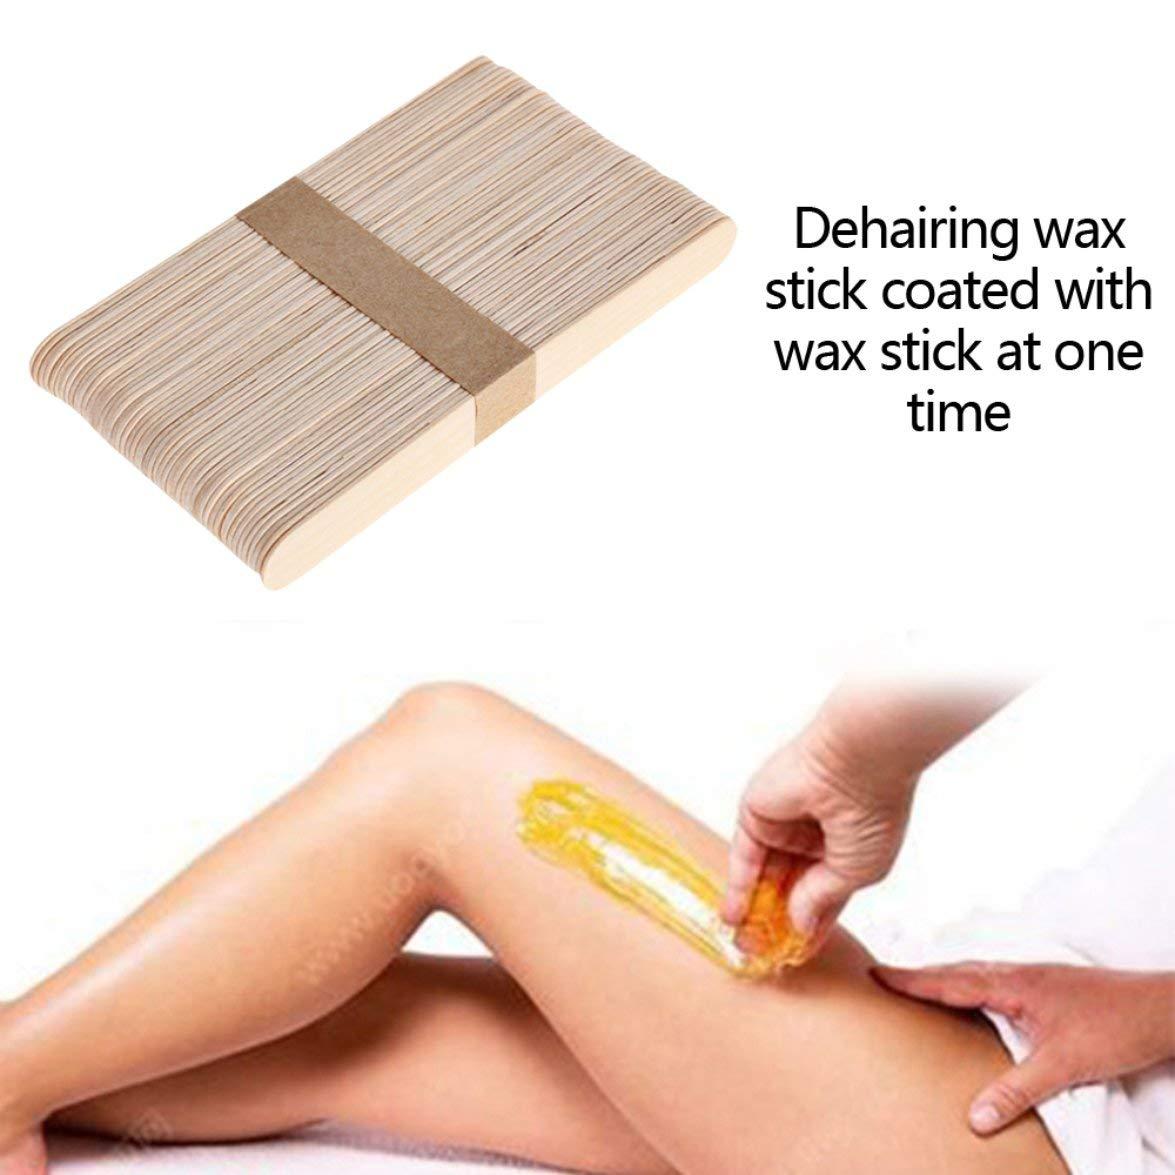 Kongqiabona Mini Wood Sticks Beauty Body Tools Depilaci/ón Cera Wood Stick Wax Stick Ice Cream Stick Mask Stick Face Sticks